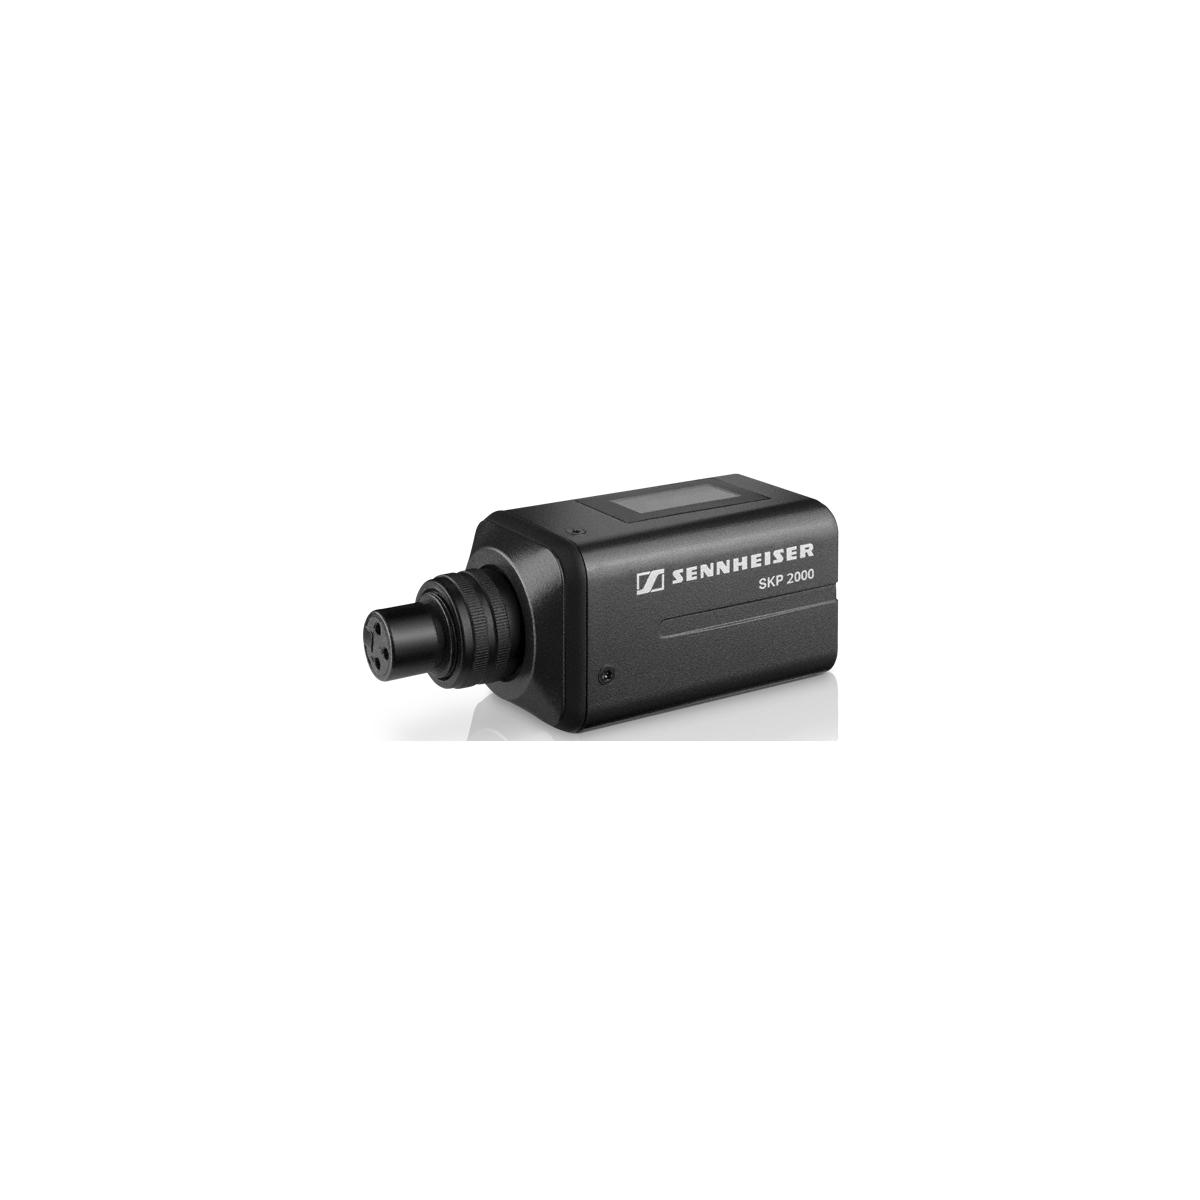 Pinces micros et accessoires - Sennheiser - SKP-2000